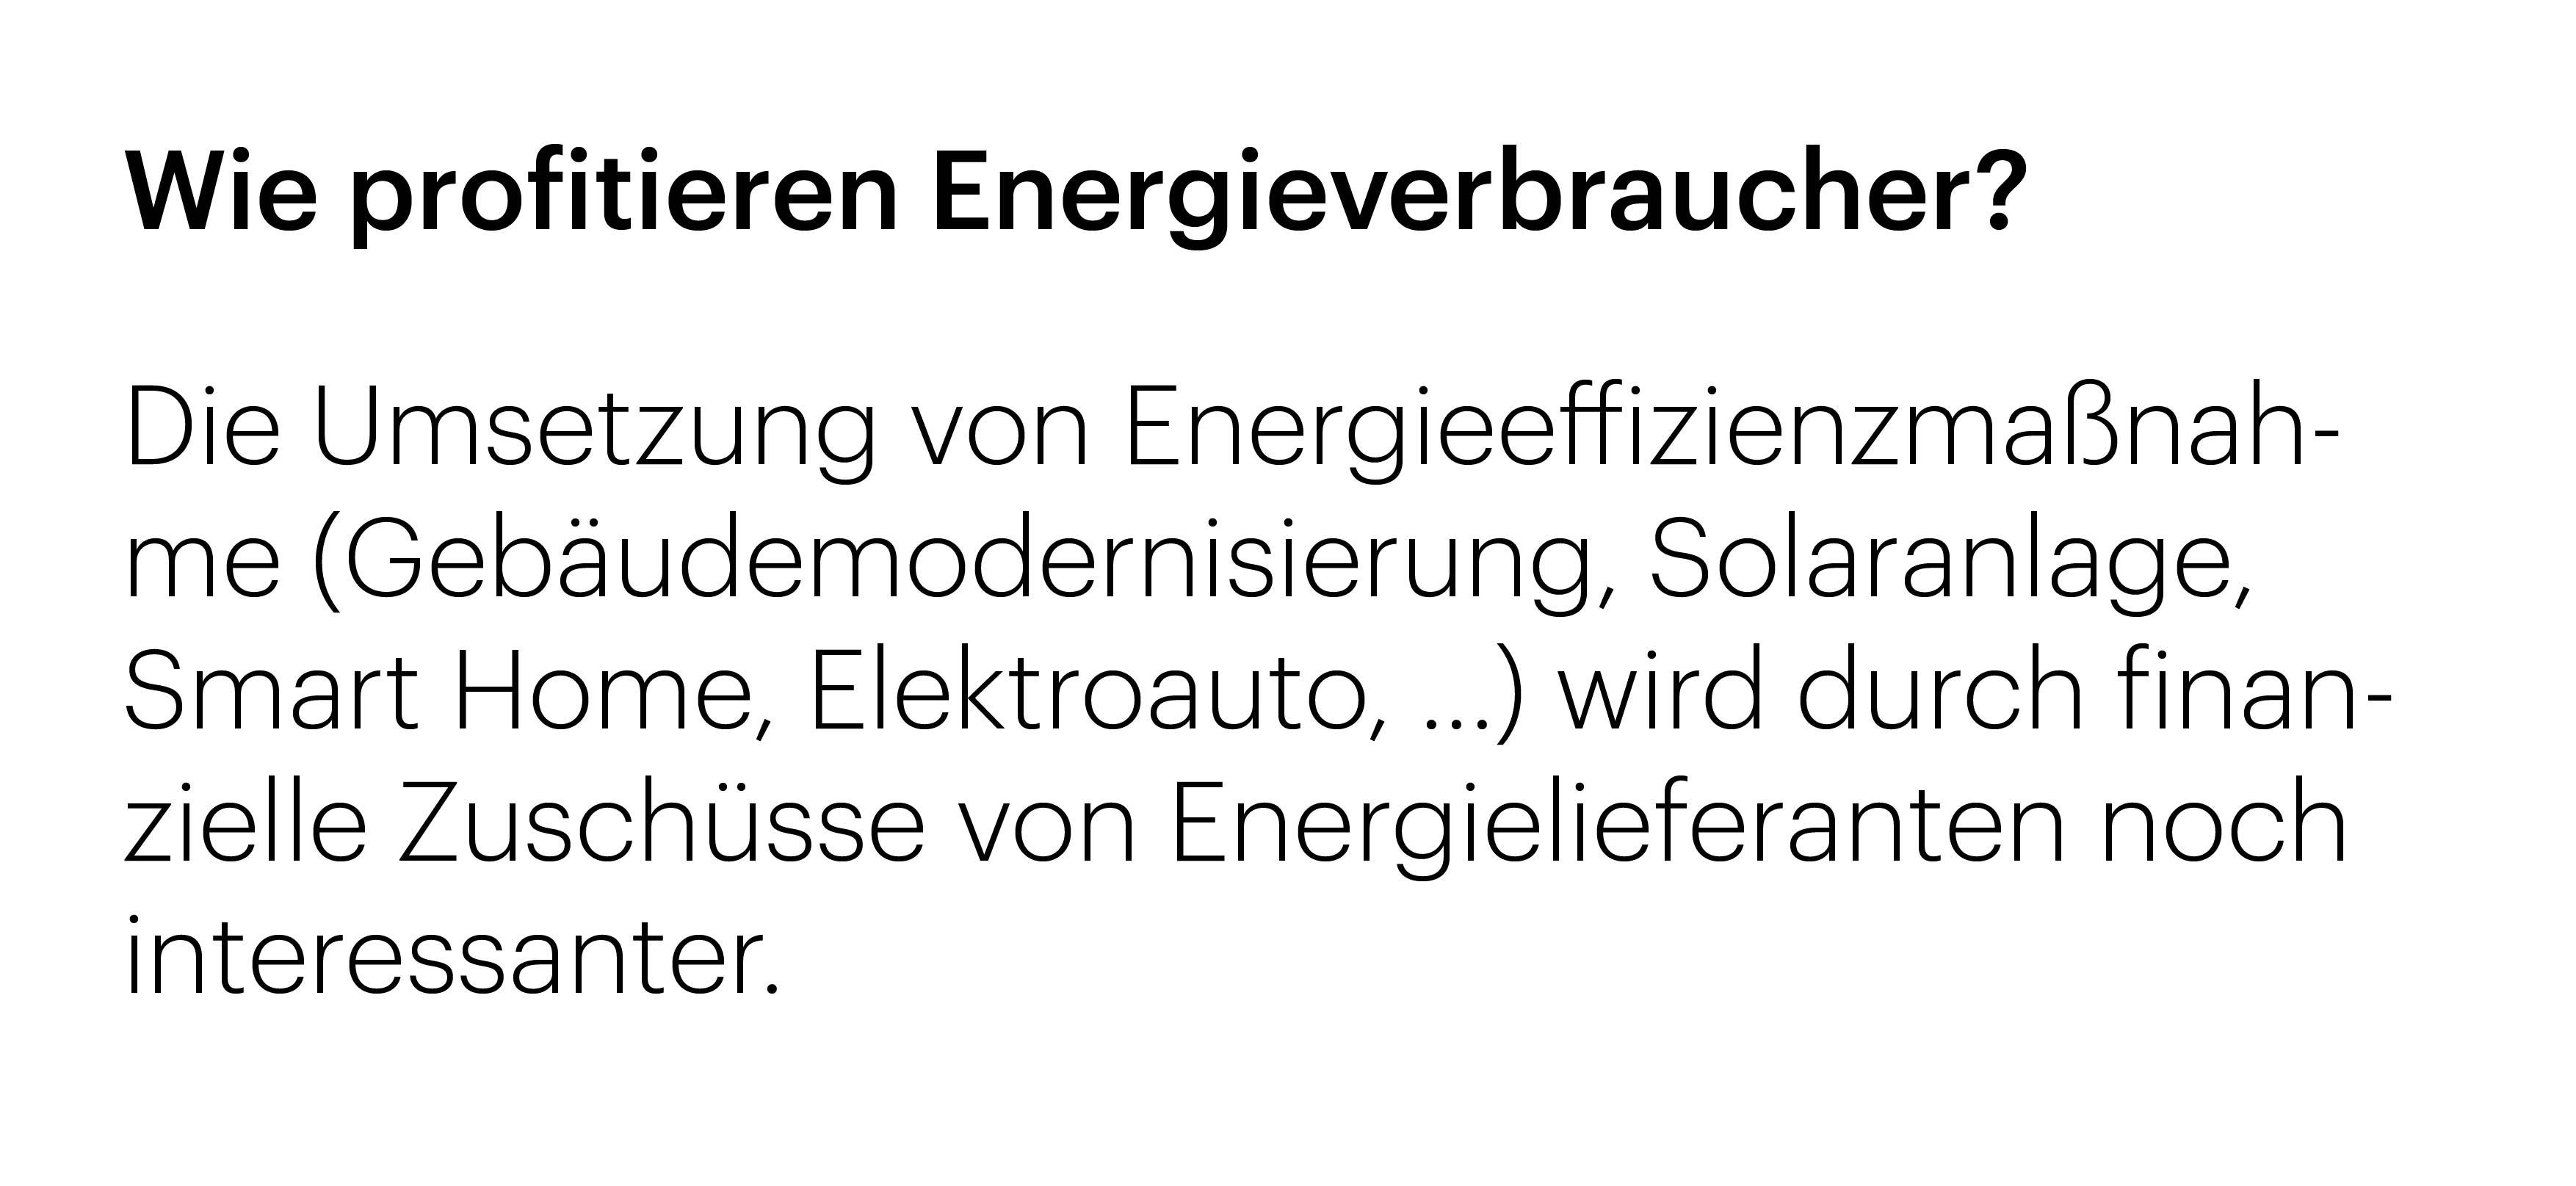 Energieauditor_Verbraucher